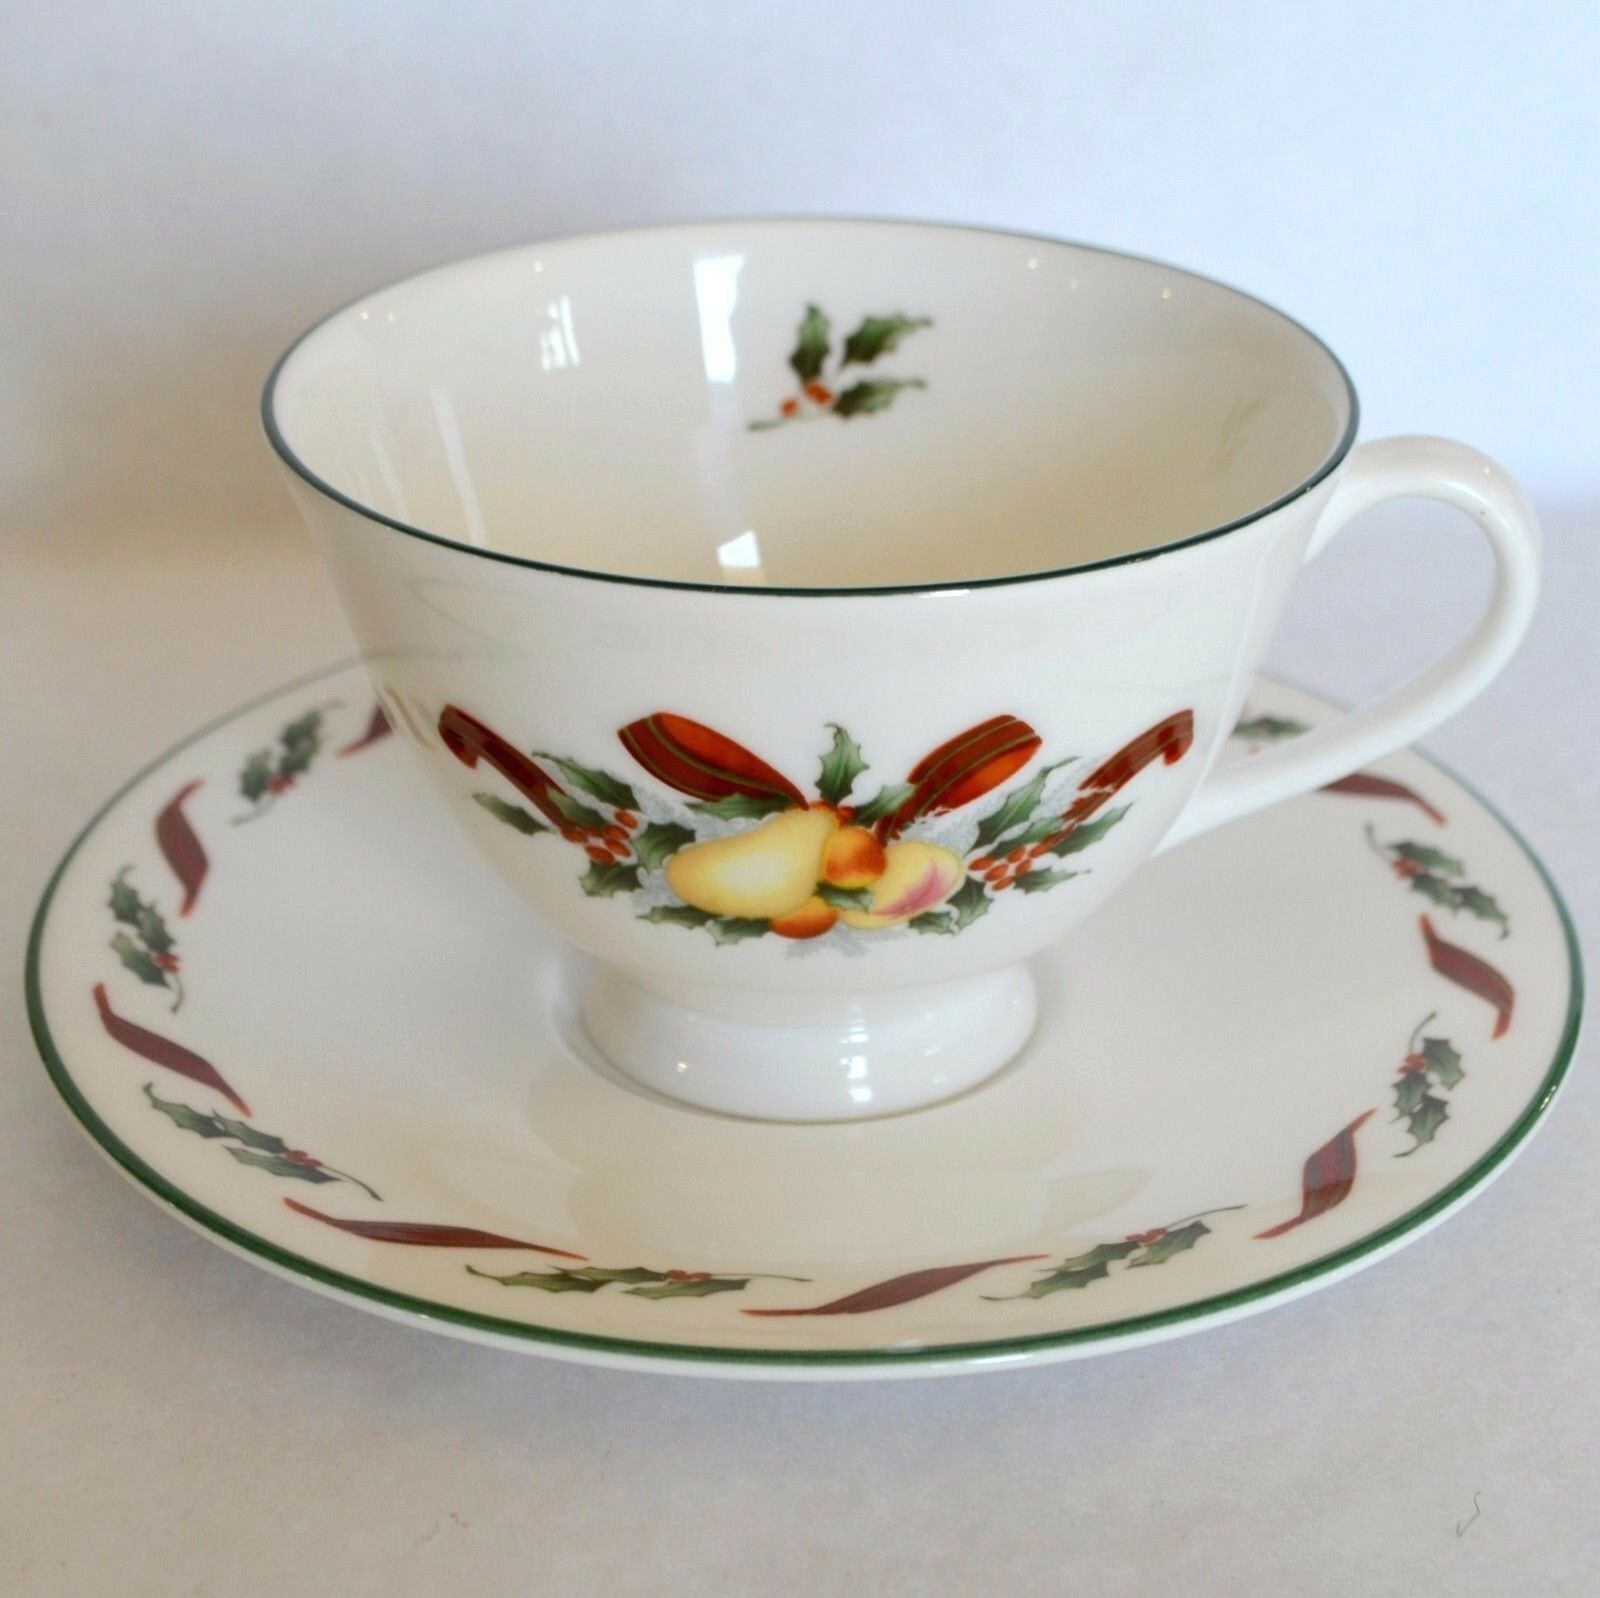 1990 Royal Doulton Festival H5167 Christmas Cup Saucer Dessert Plate For Sale Online Ebay